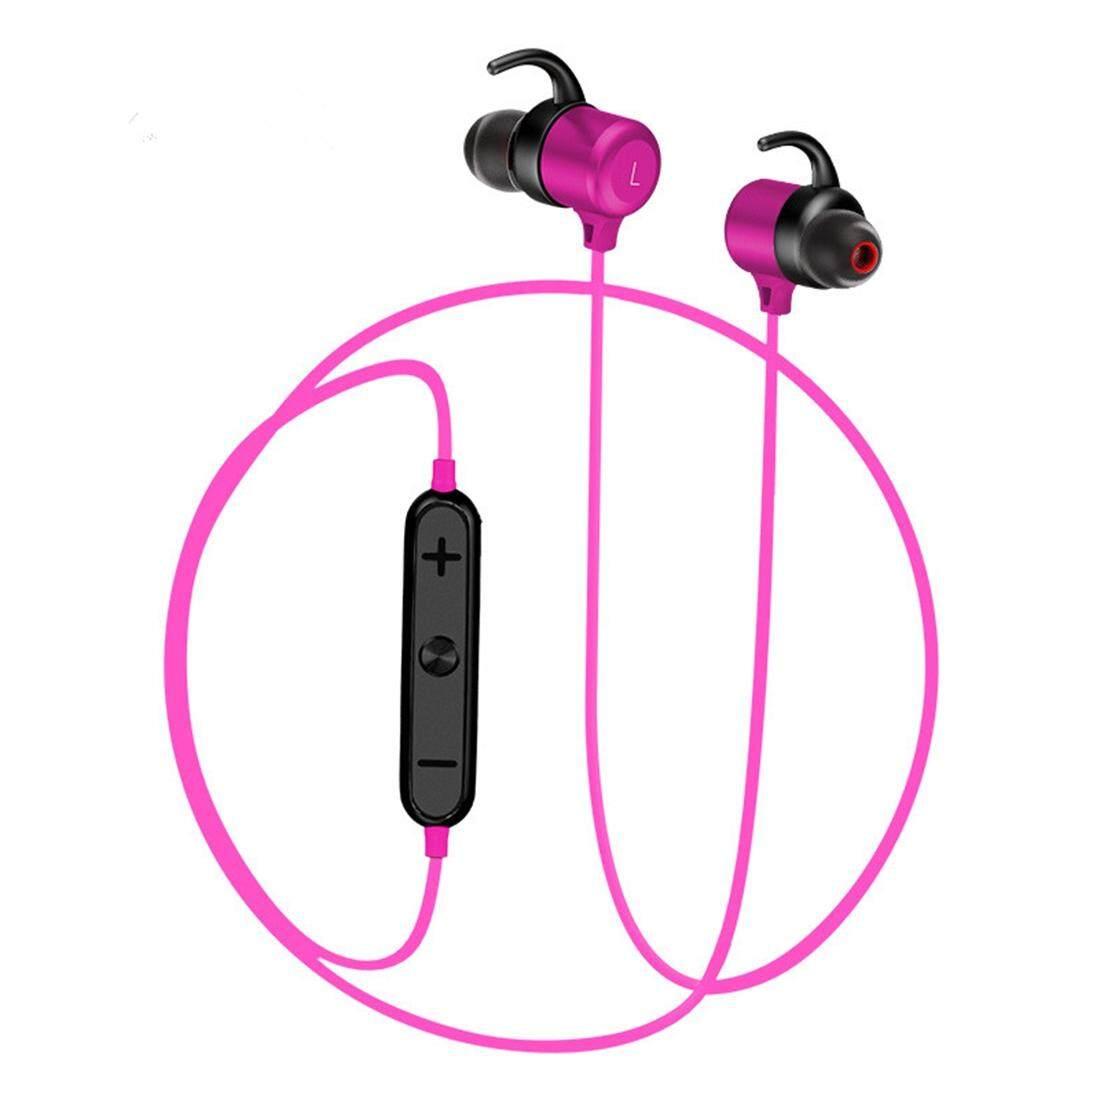 BTH-Y8 Ultra - light EAR - Hook Wireless V4.1 บลูทูธหูฟังชนิดแม่เหล็ก, สำหรับ iPad, iPhone, Galaxy, huawei, Xiaomi, LG, HTC และโทรศัพท์สมาร์ทอื่นๆ (สีเขียว)